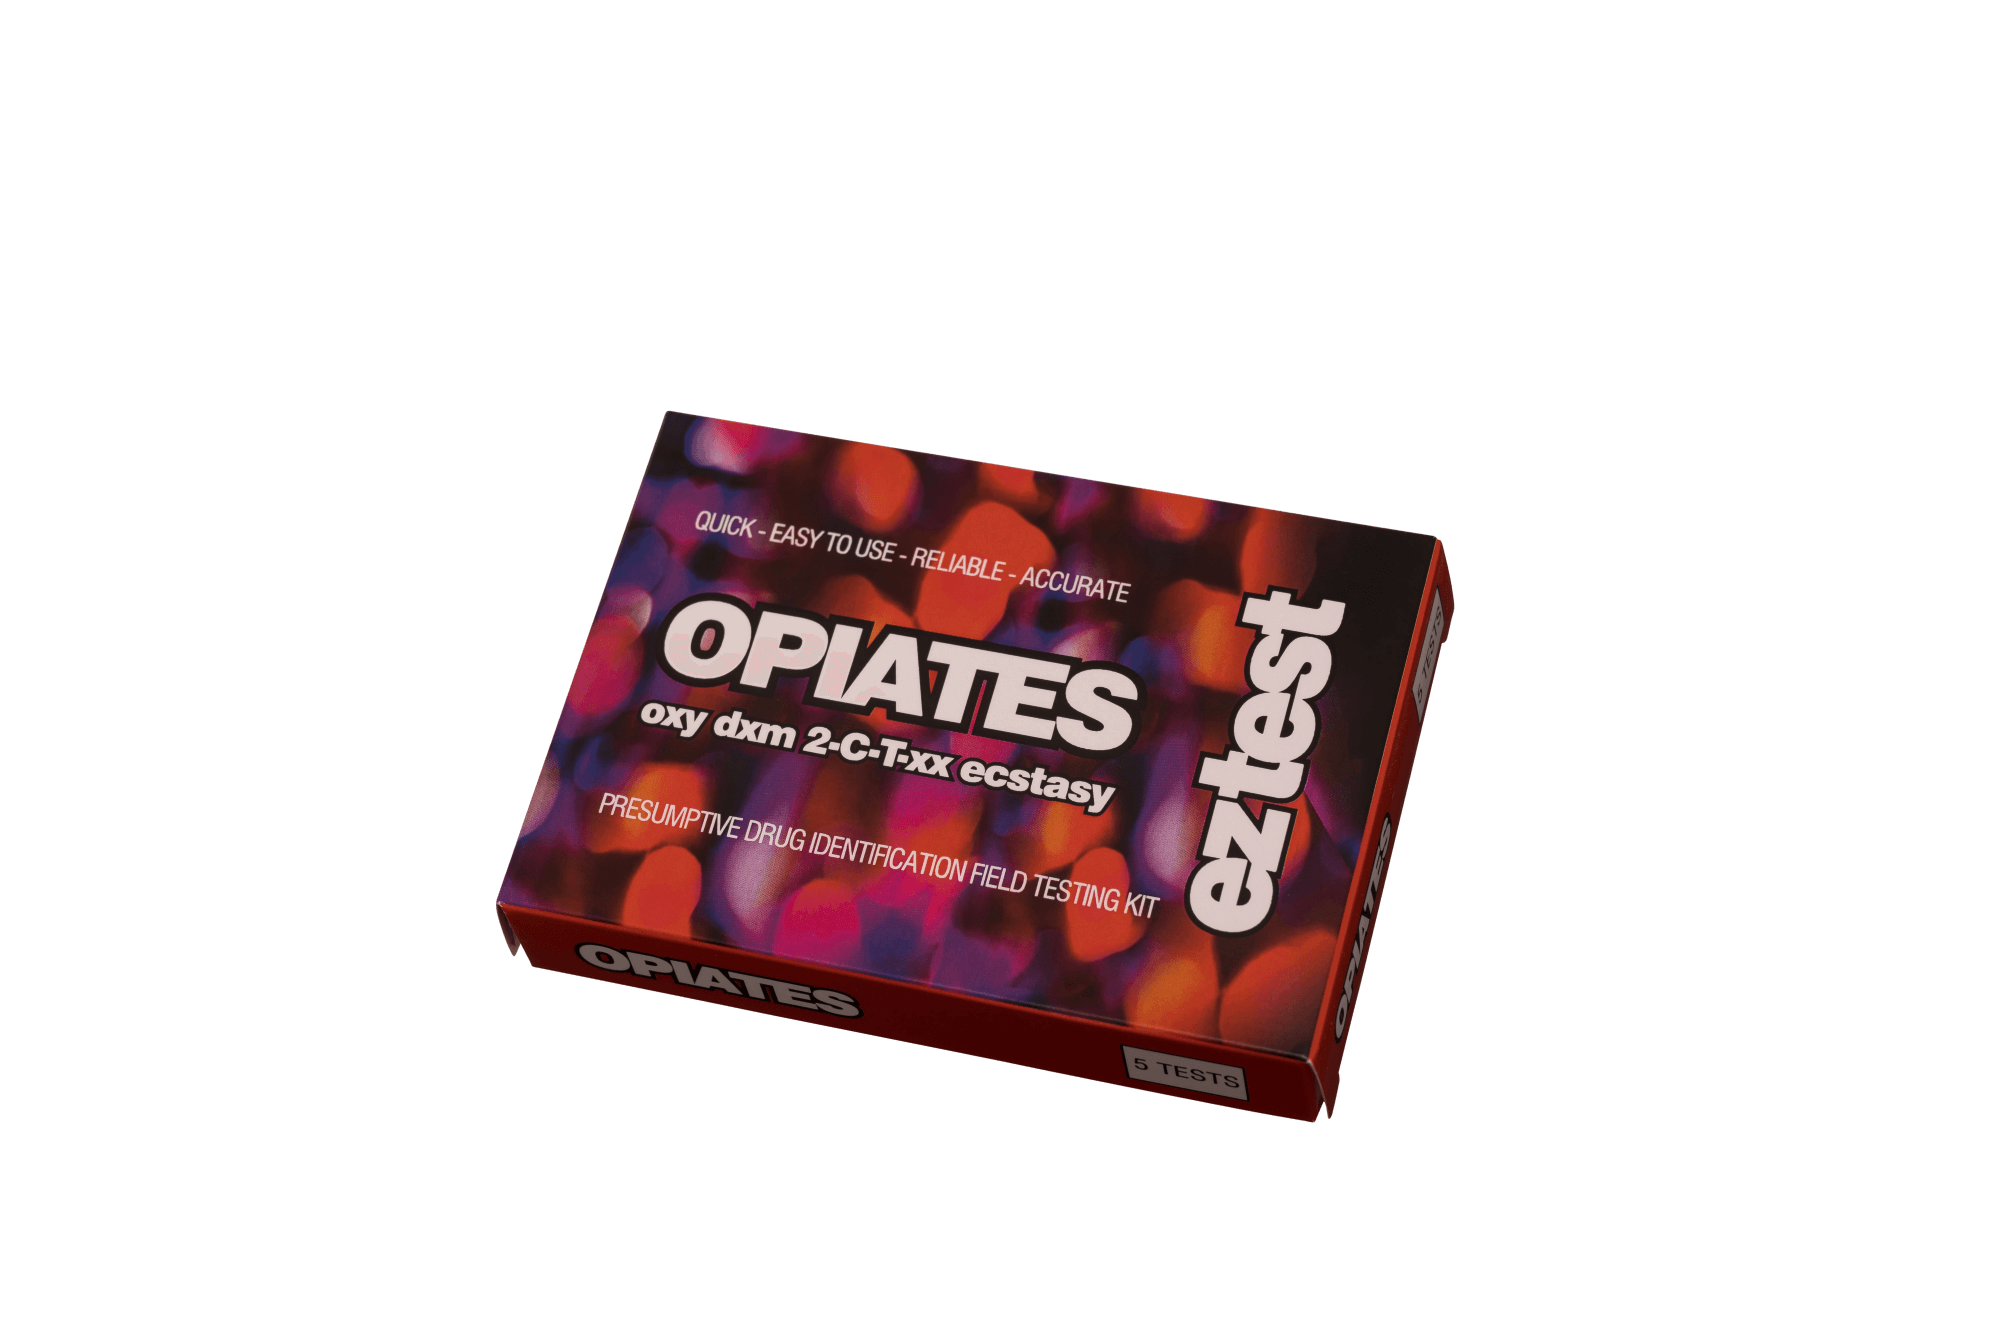 Opiates 5 Use Drug Testing Kit